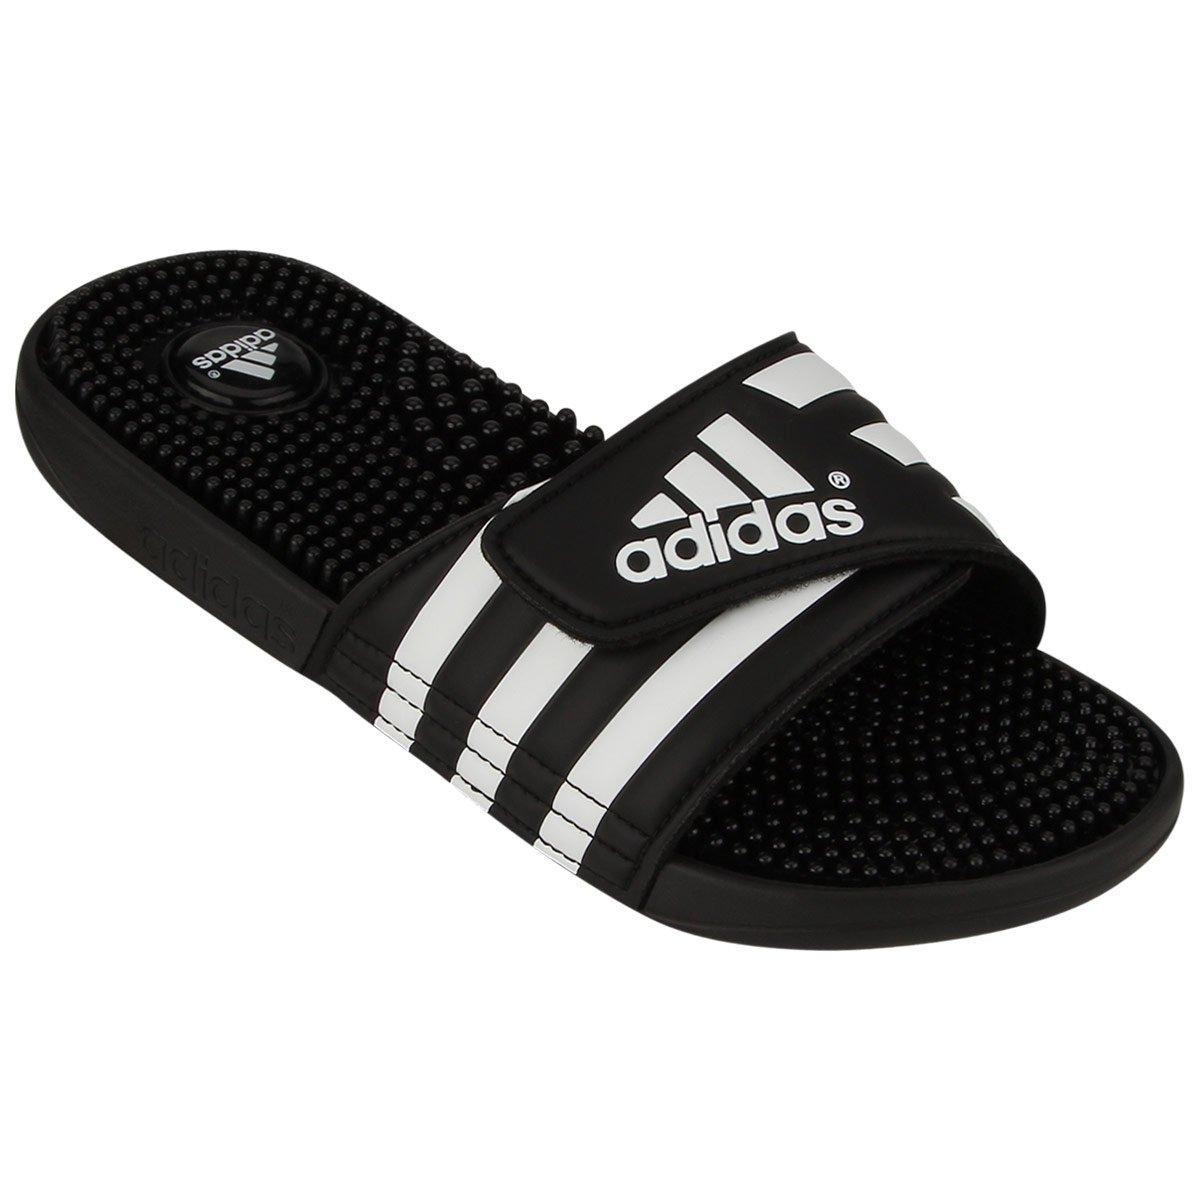 3cdfa4062a6e ... chinelos nike e adidas Chinelo Adidas Adissage - Preto e Branco ...